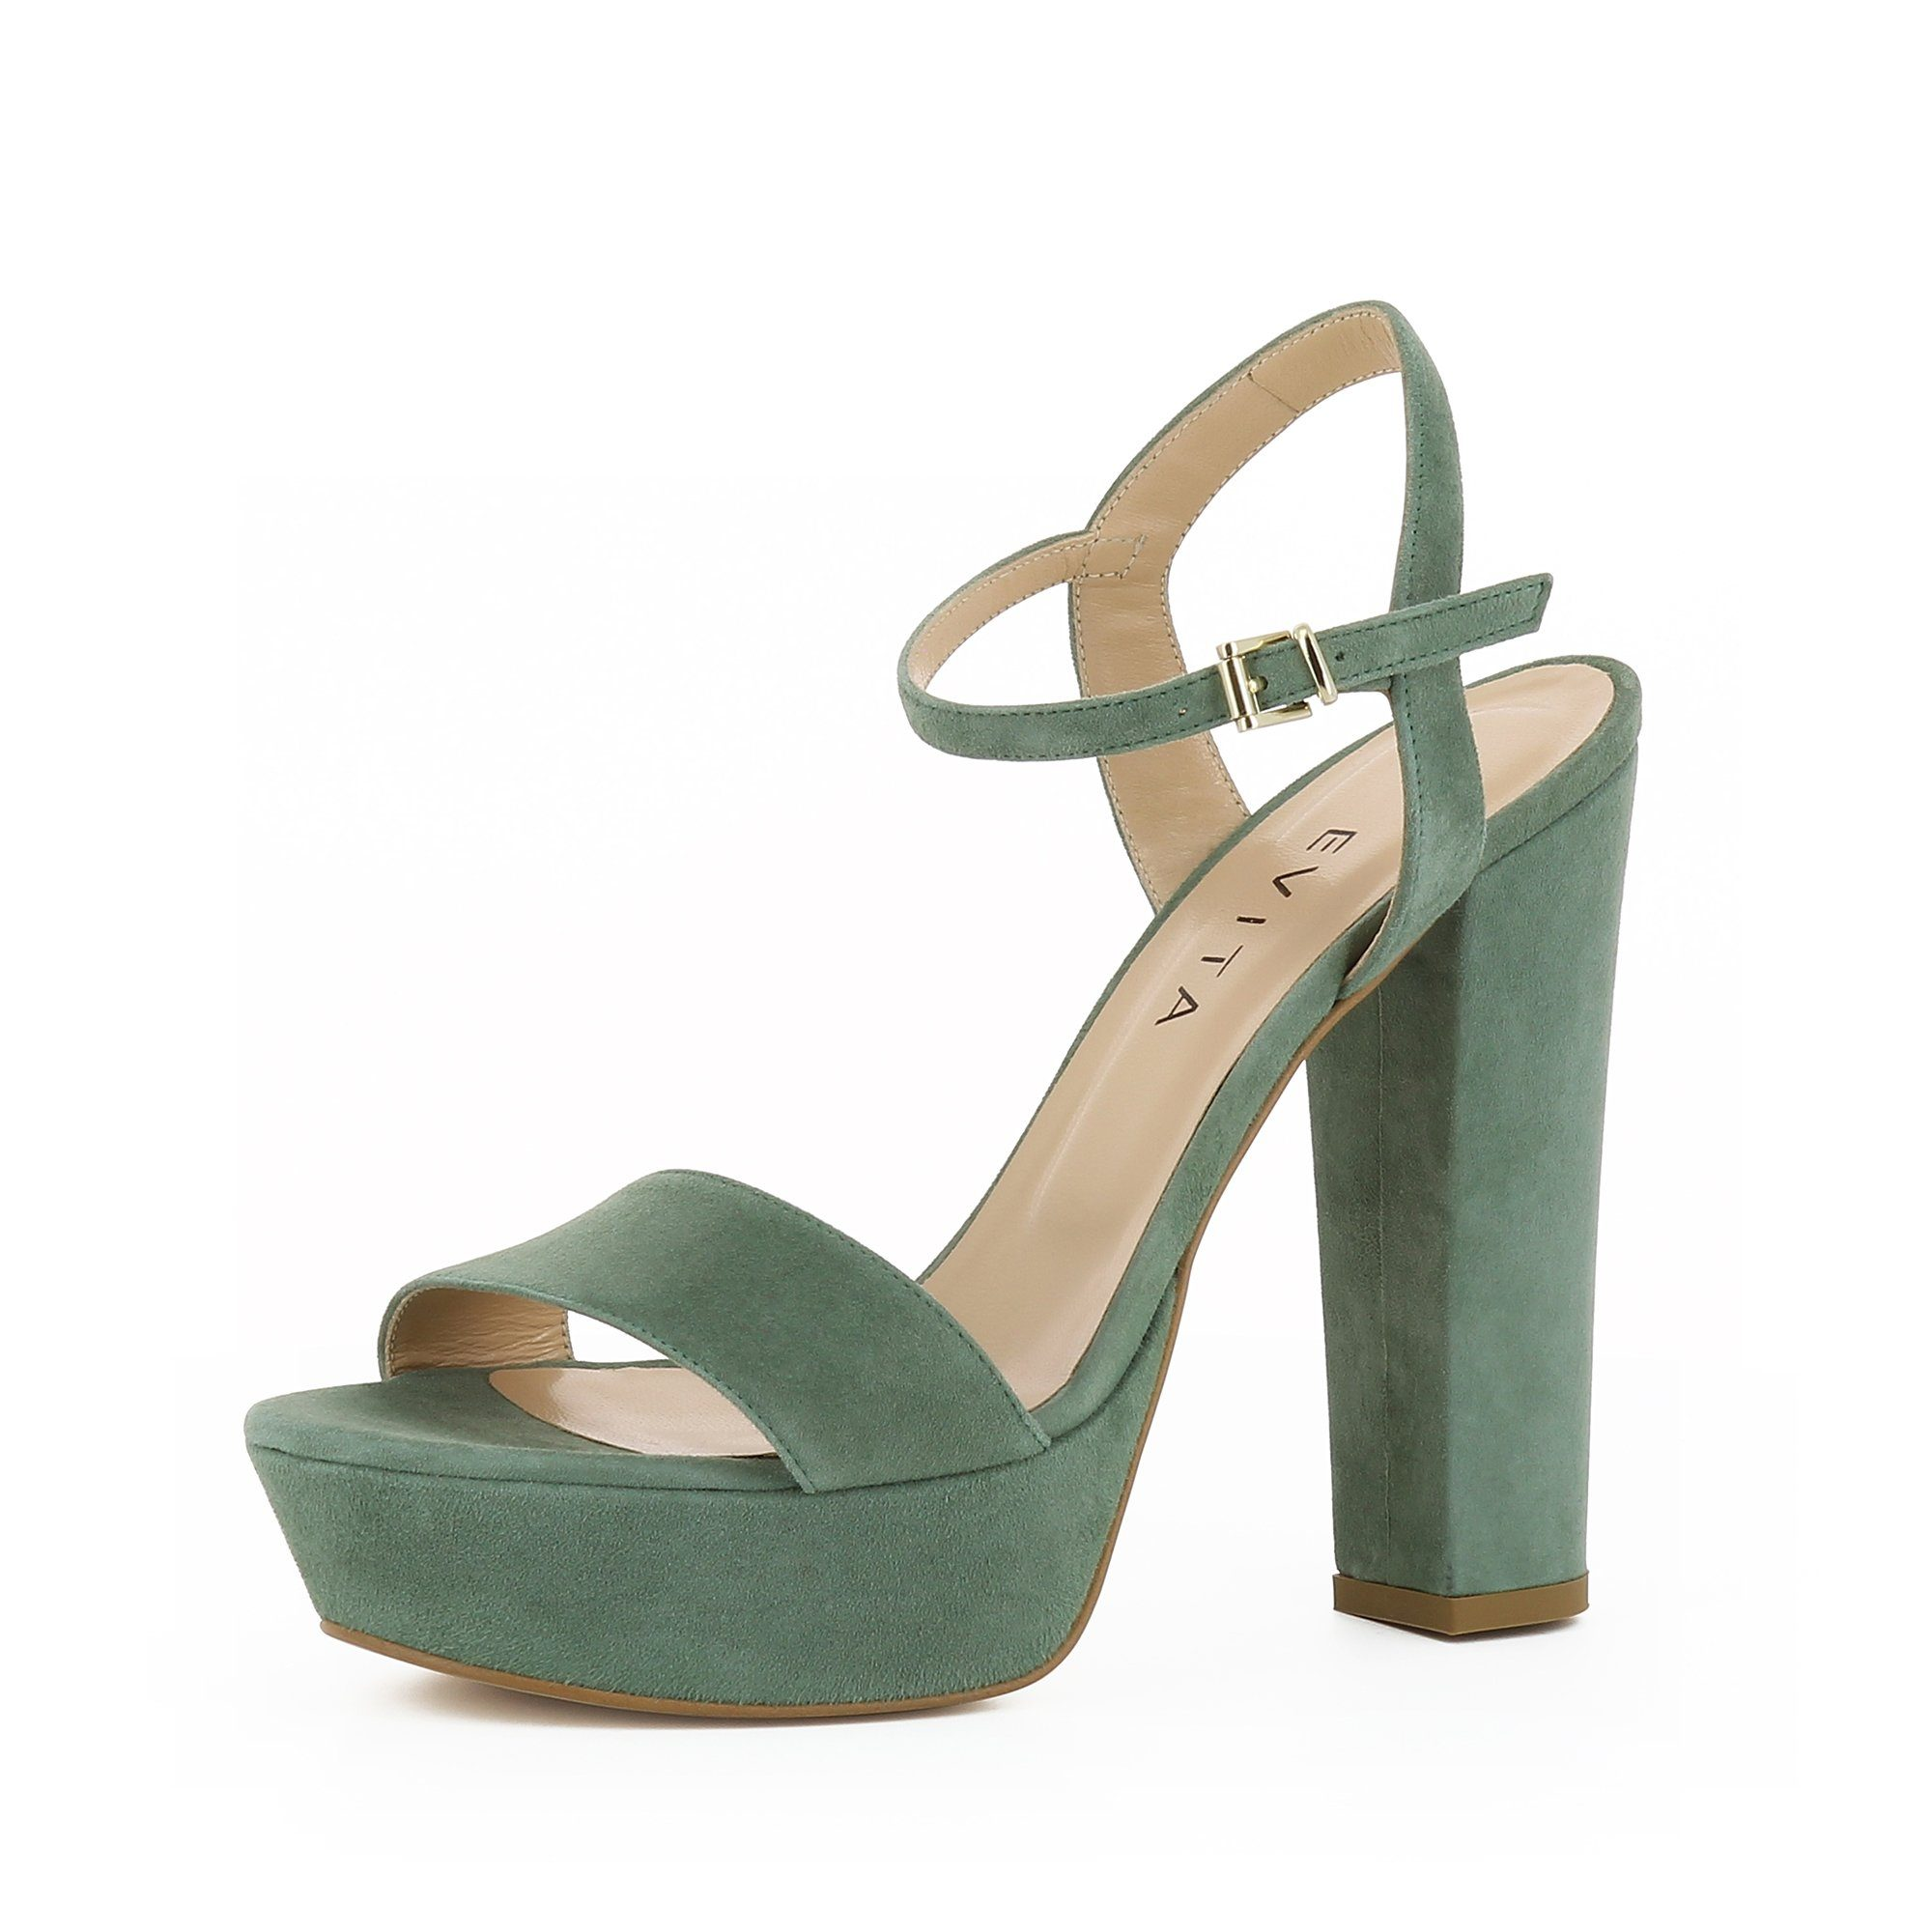 Evita STEFANIA High-Heel-Sandalette kaufen  olivgrün